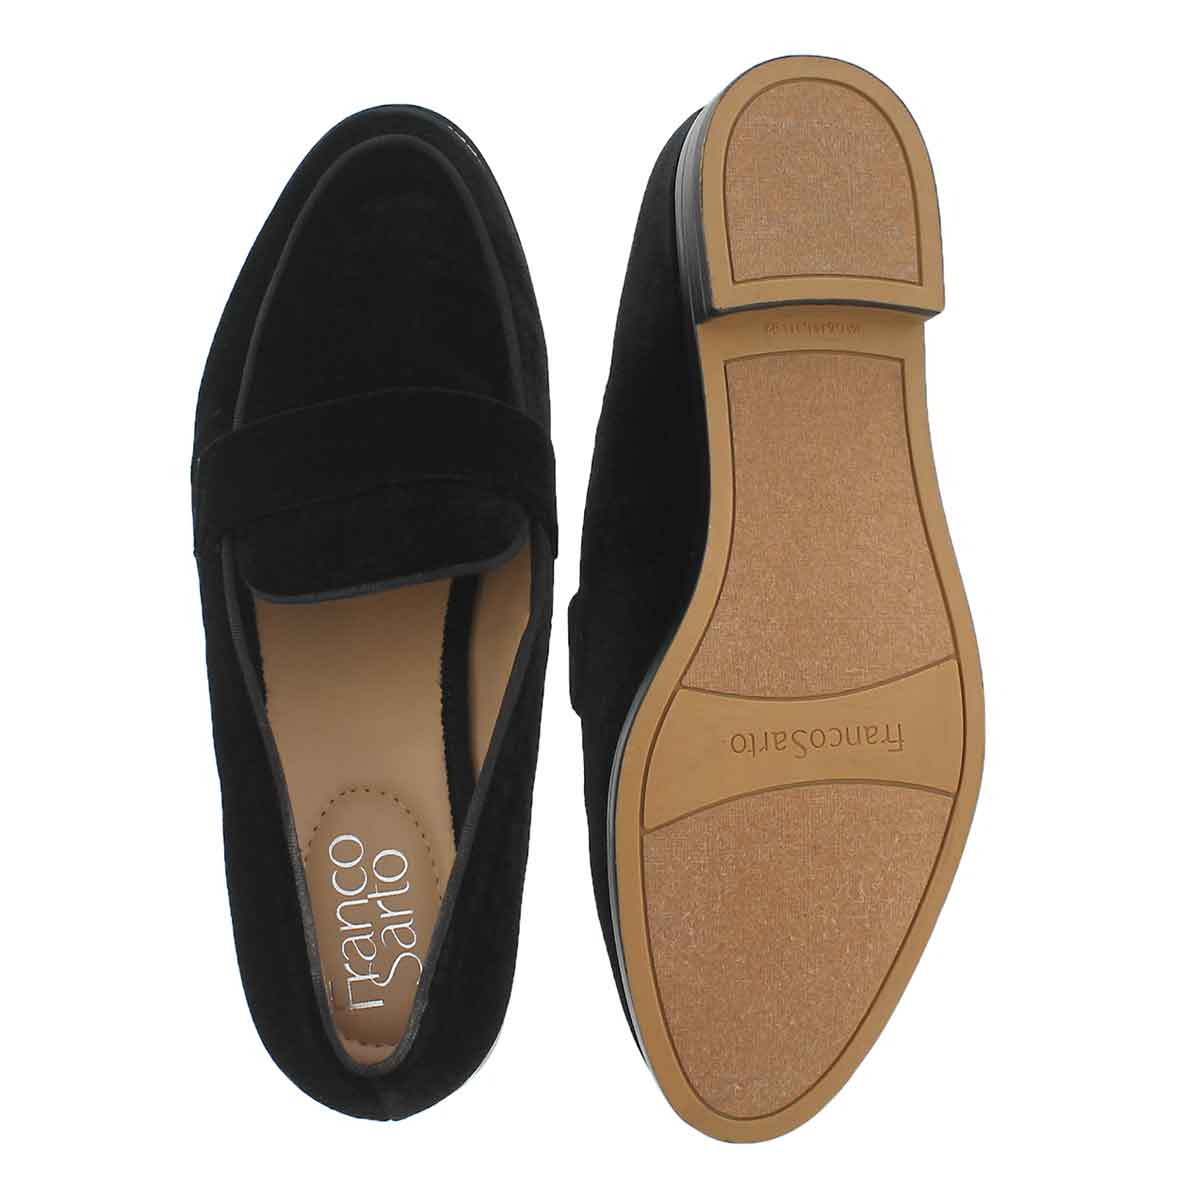 Lds Hudley black casual slip on shoe